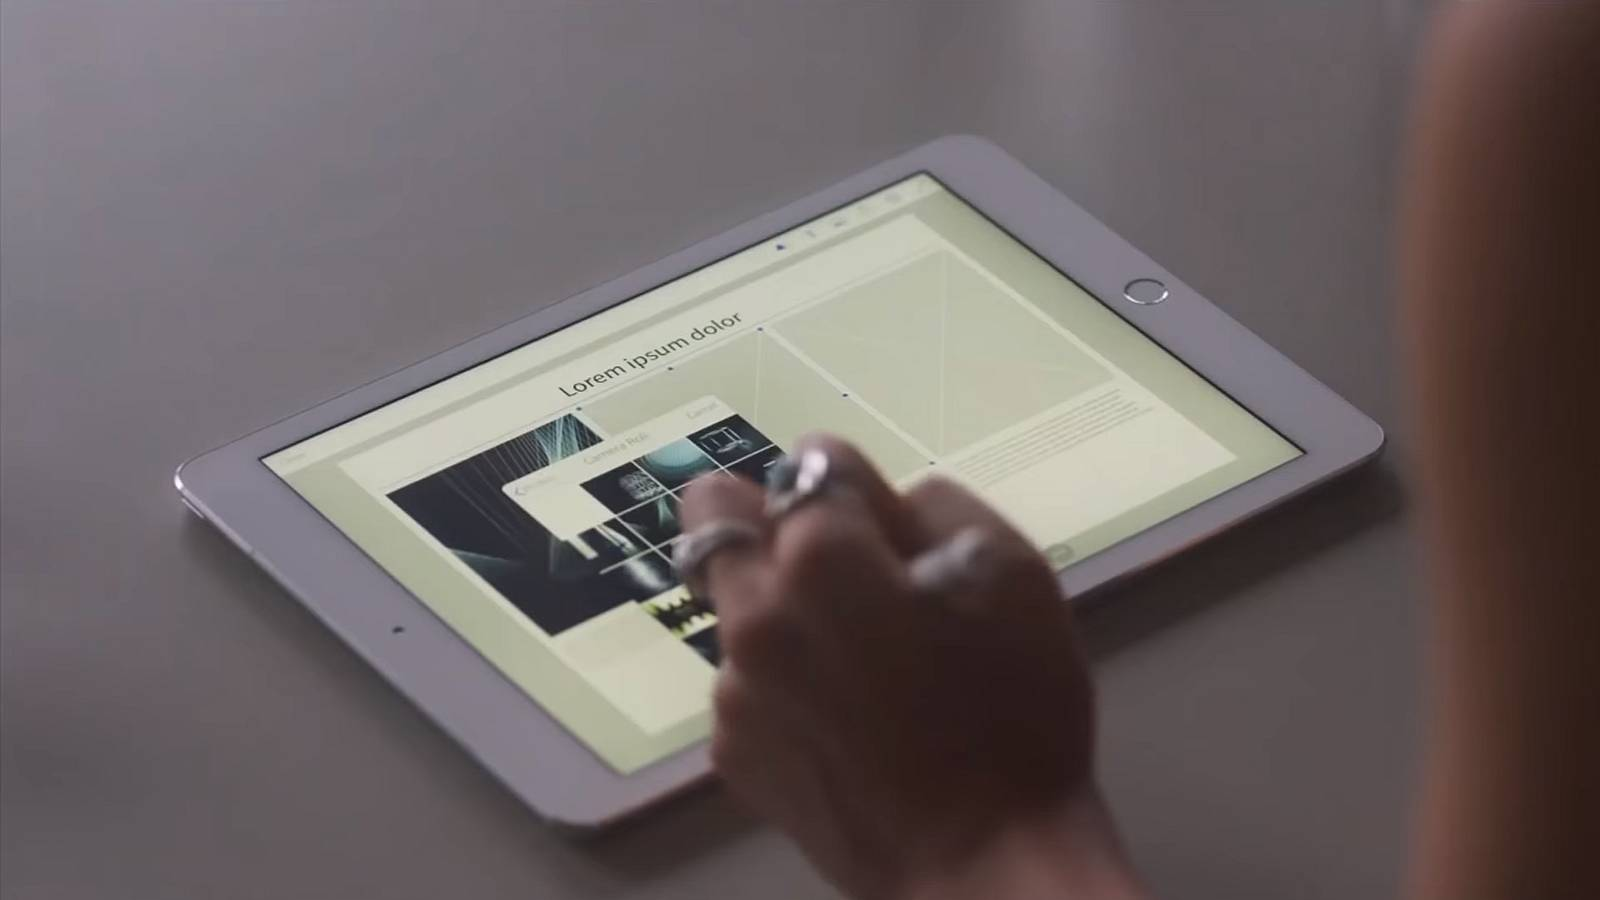 Review iPad Pro 9.7